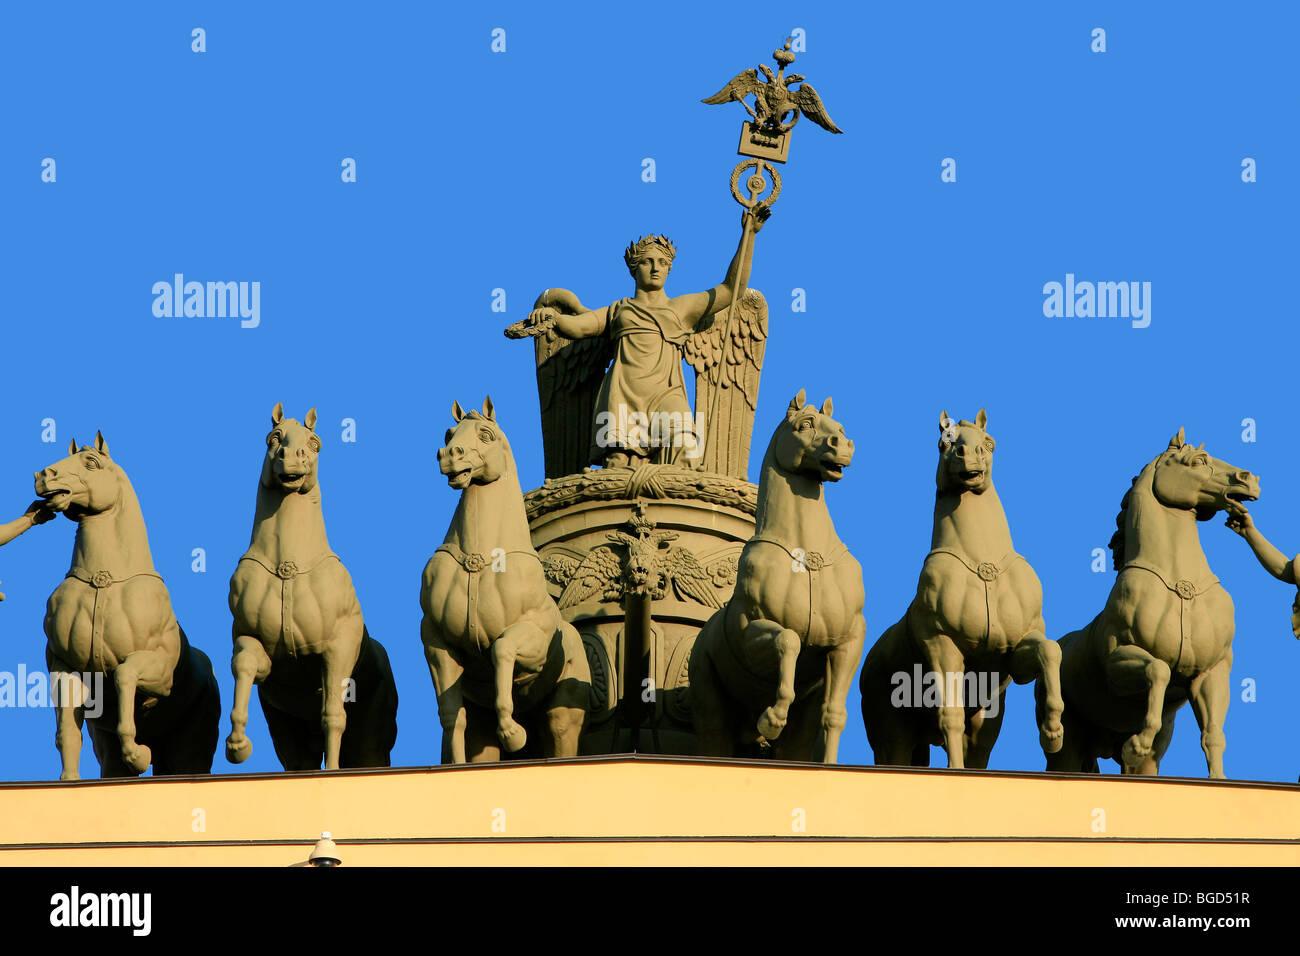 File:Brandenburg Gate Quadriga at Night.jpg - Wikipedia